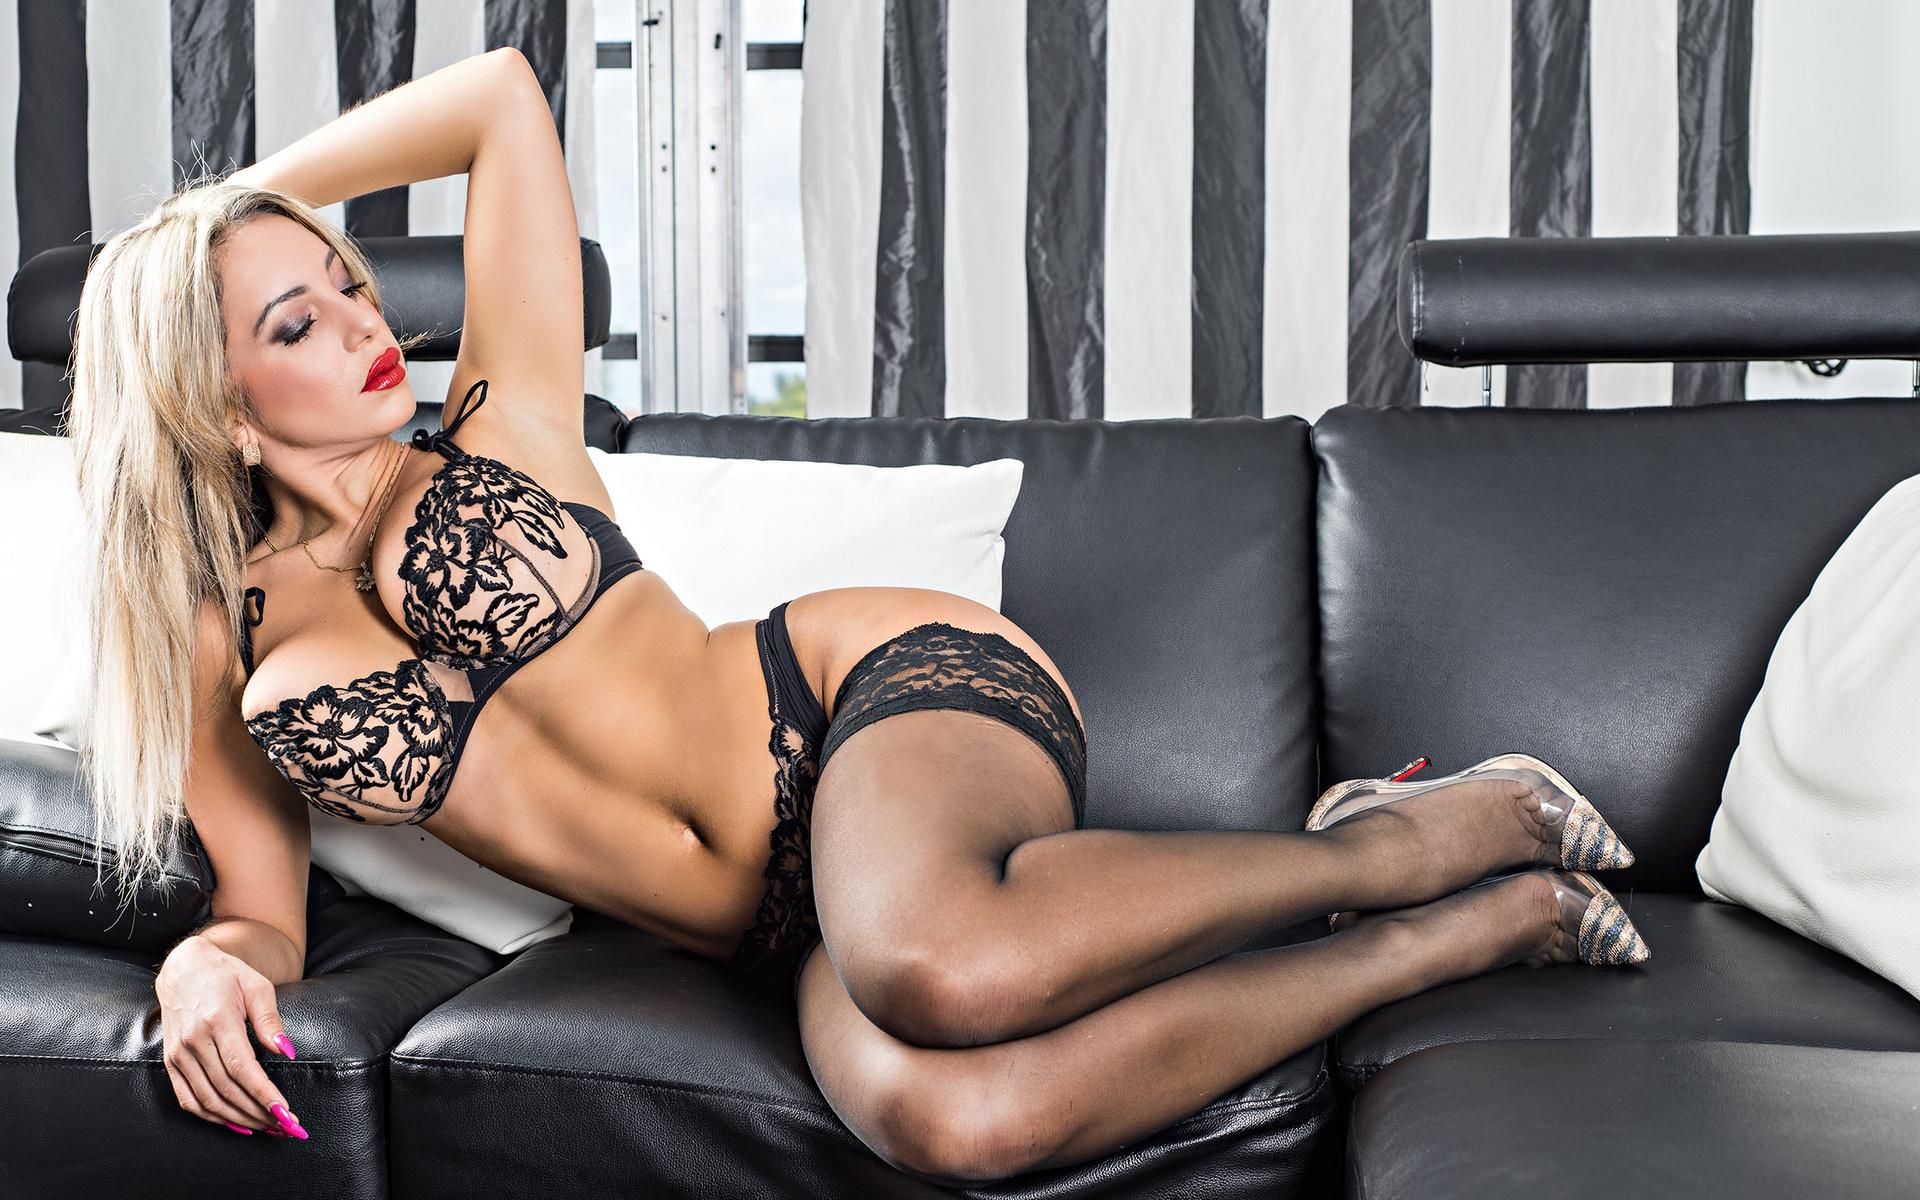 Порно онлайн блондинки на шпильках